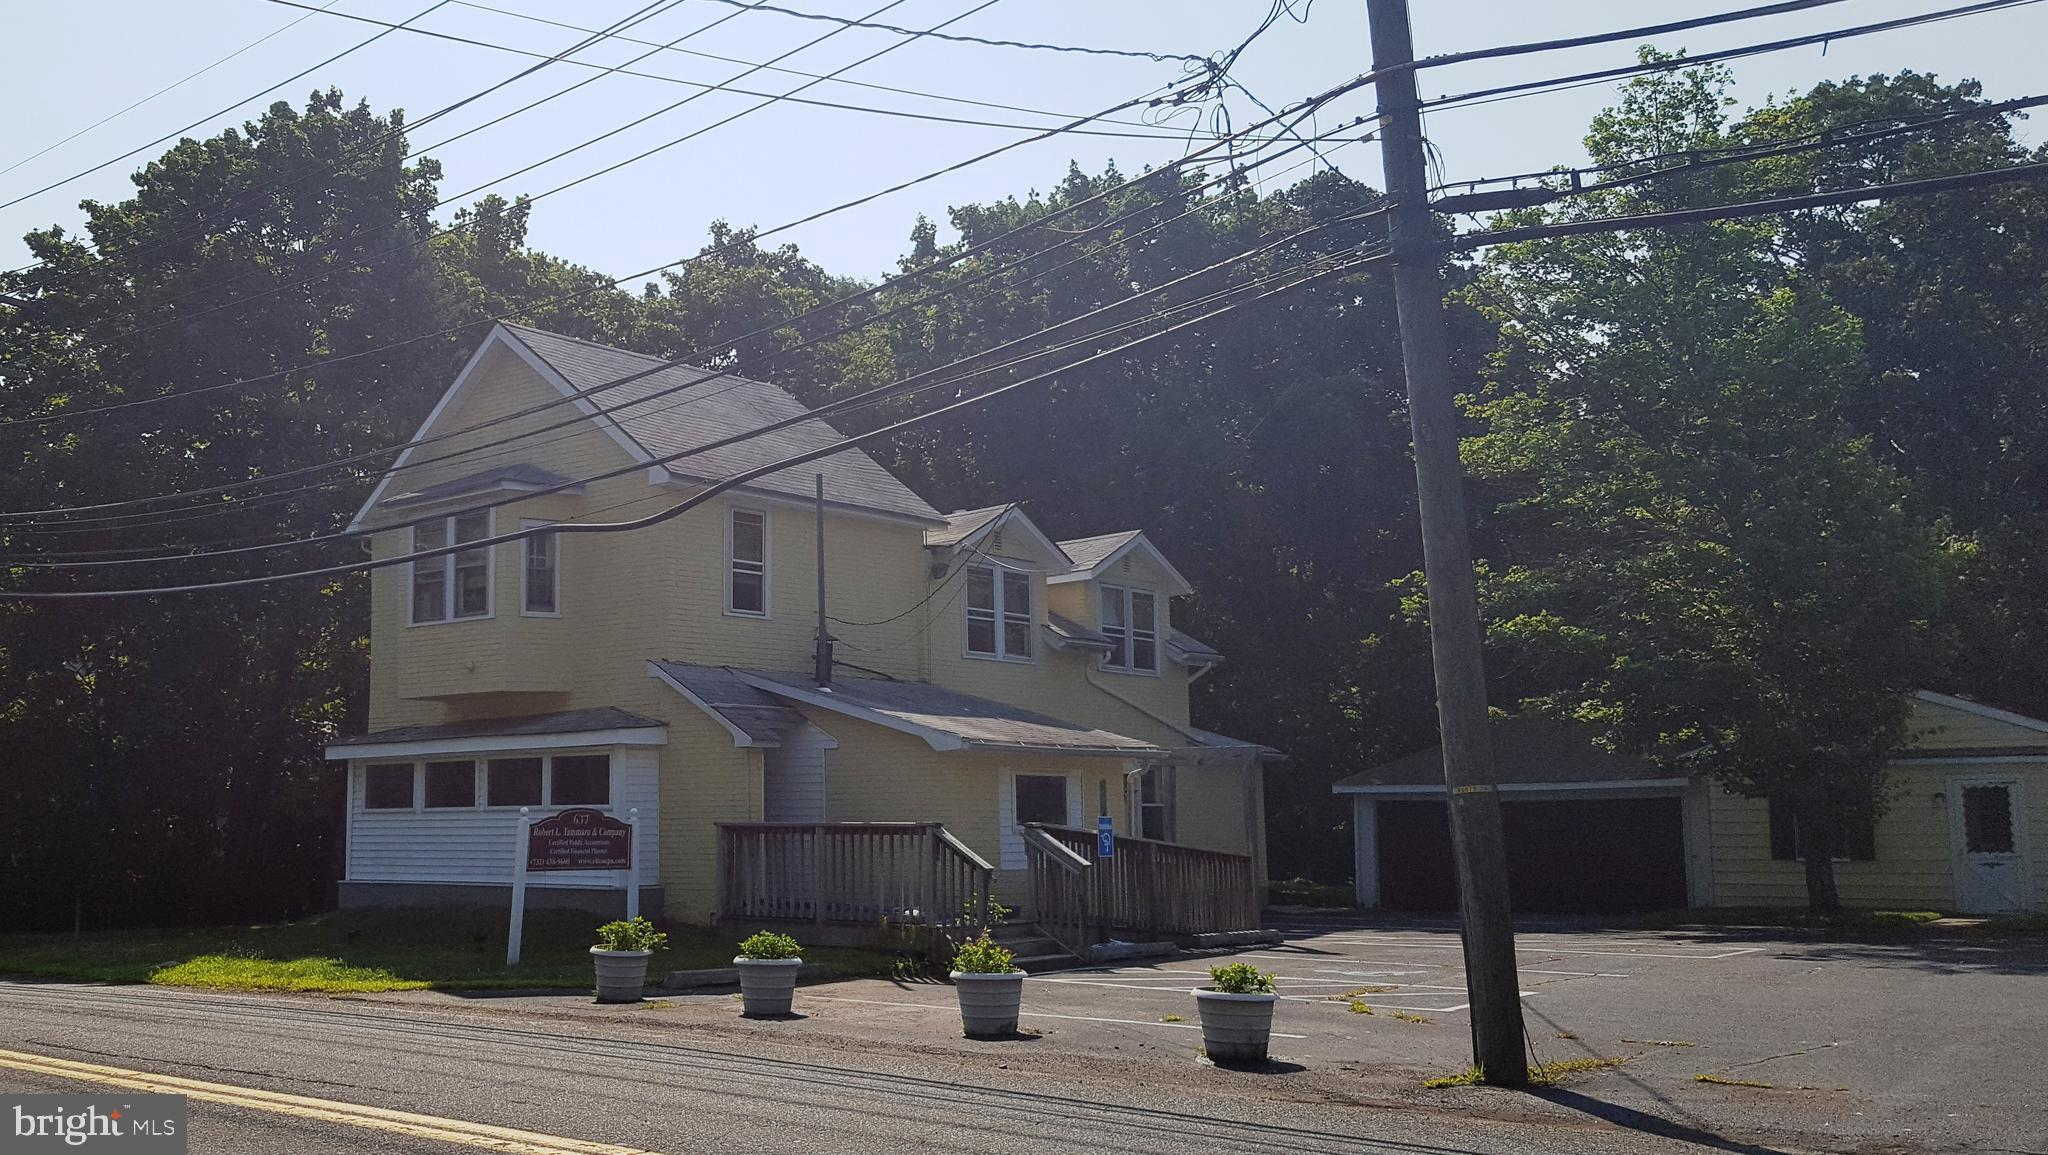 637 RIDGE ROAD, MONMOUTH JUNCTION, NJ 08852